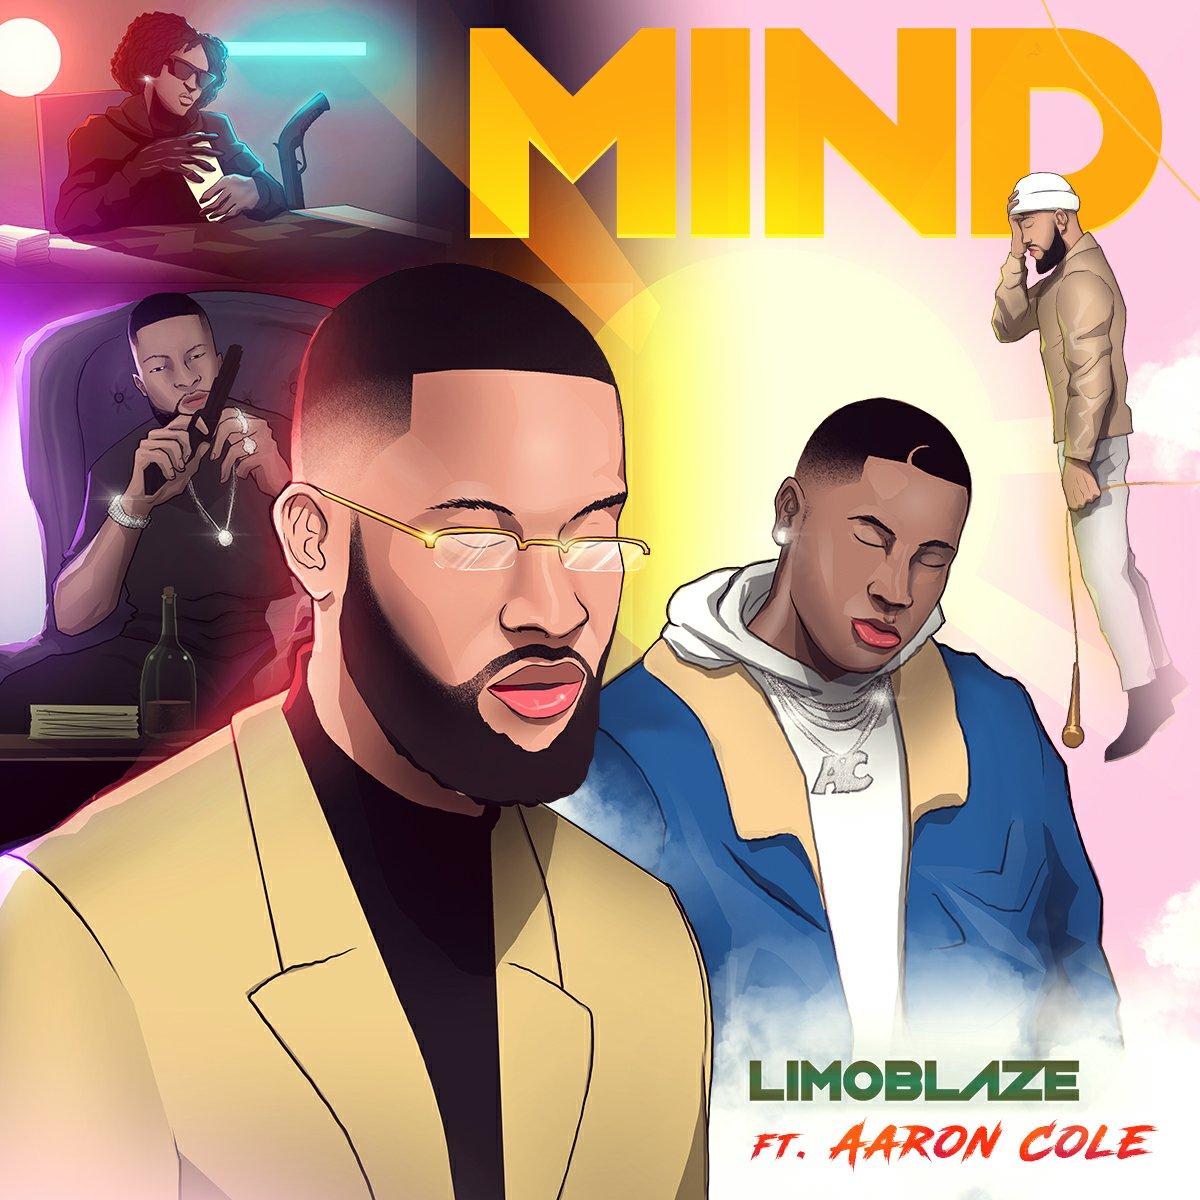 "DOWNLOAD Music: Limoblaze – Mind ""Remix"" (ft. Aaron Cole)"